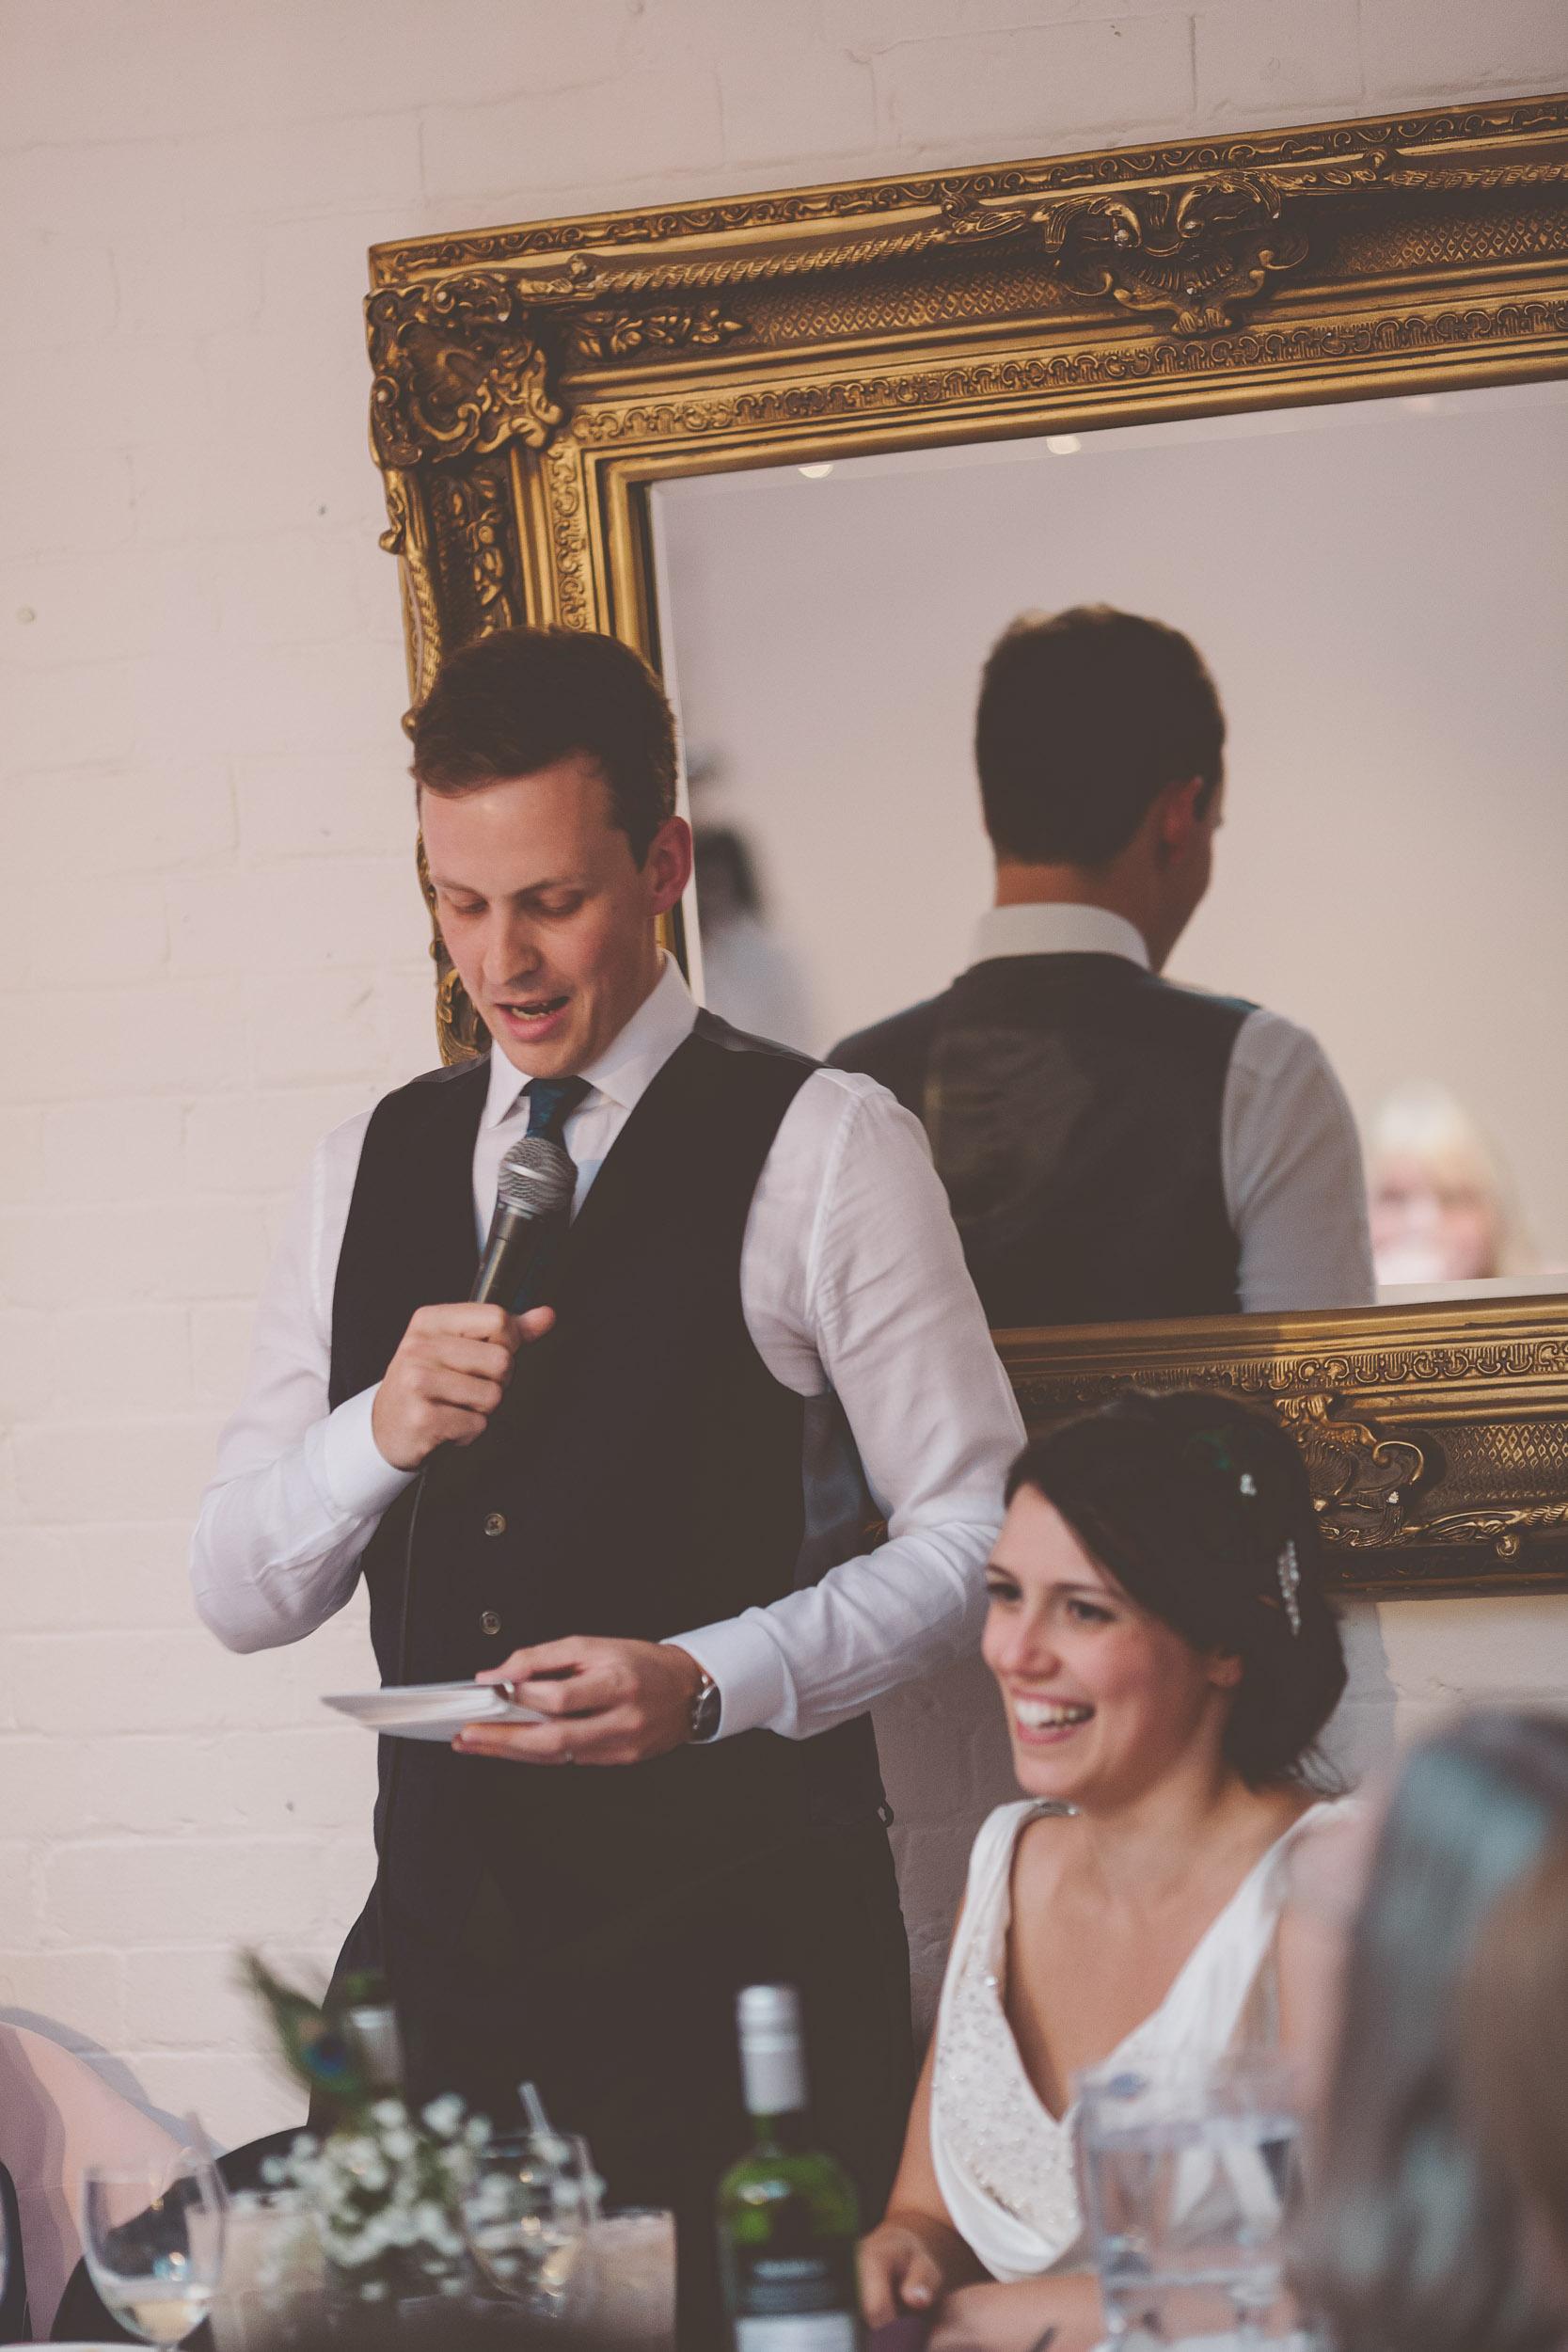 islington-town-hall-4th-floor-studios-wedding371.jpg